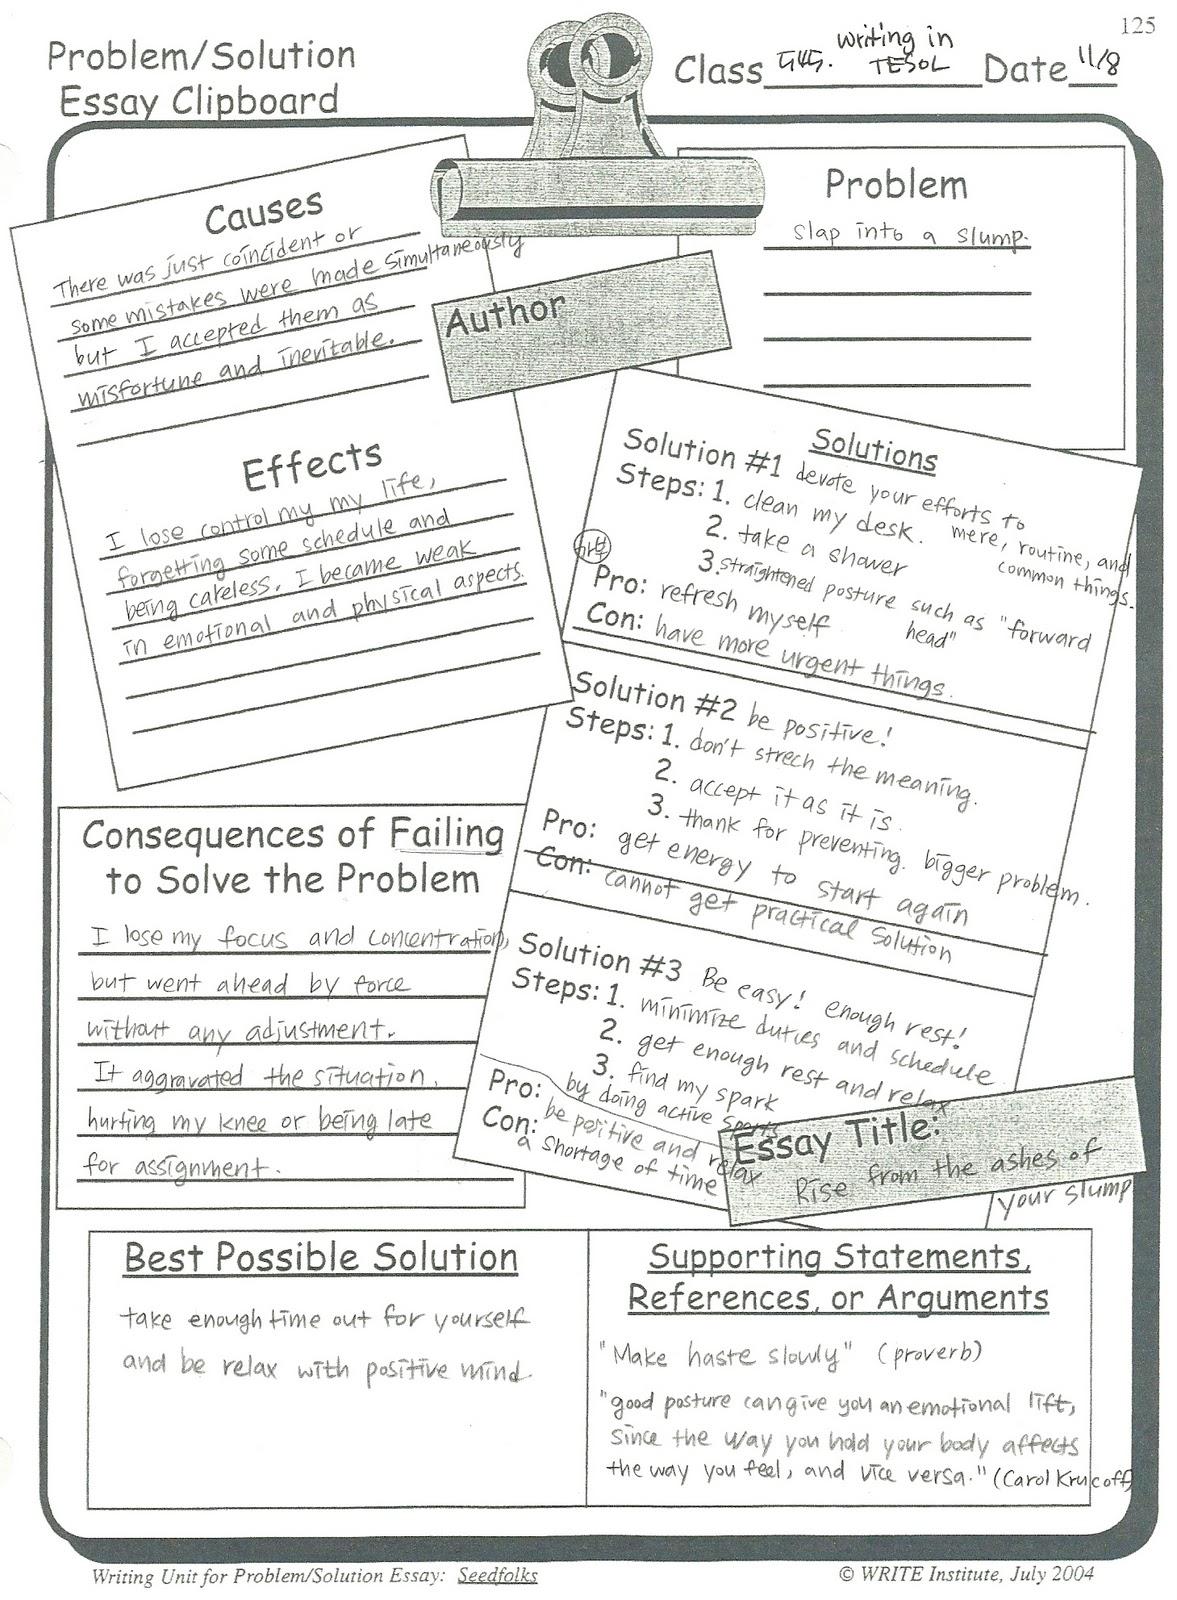 Nuremberg trials essay